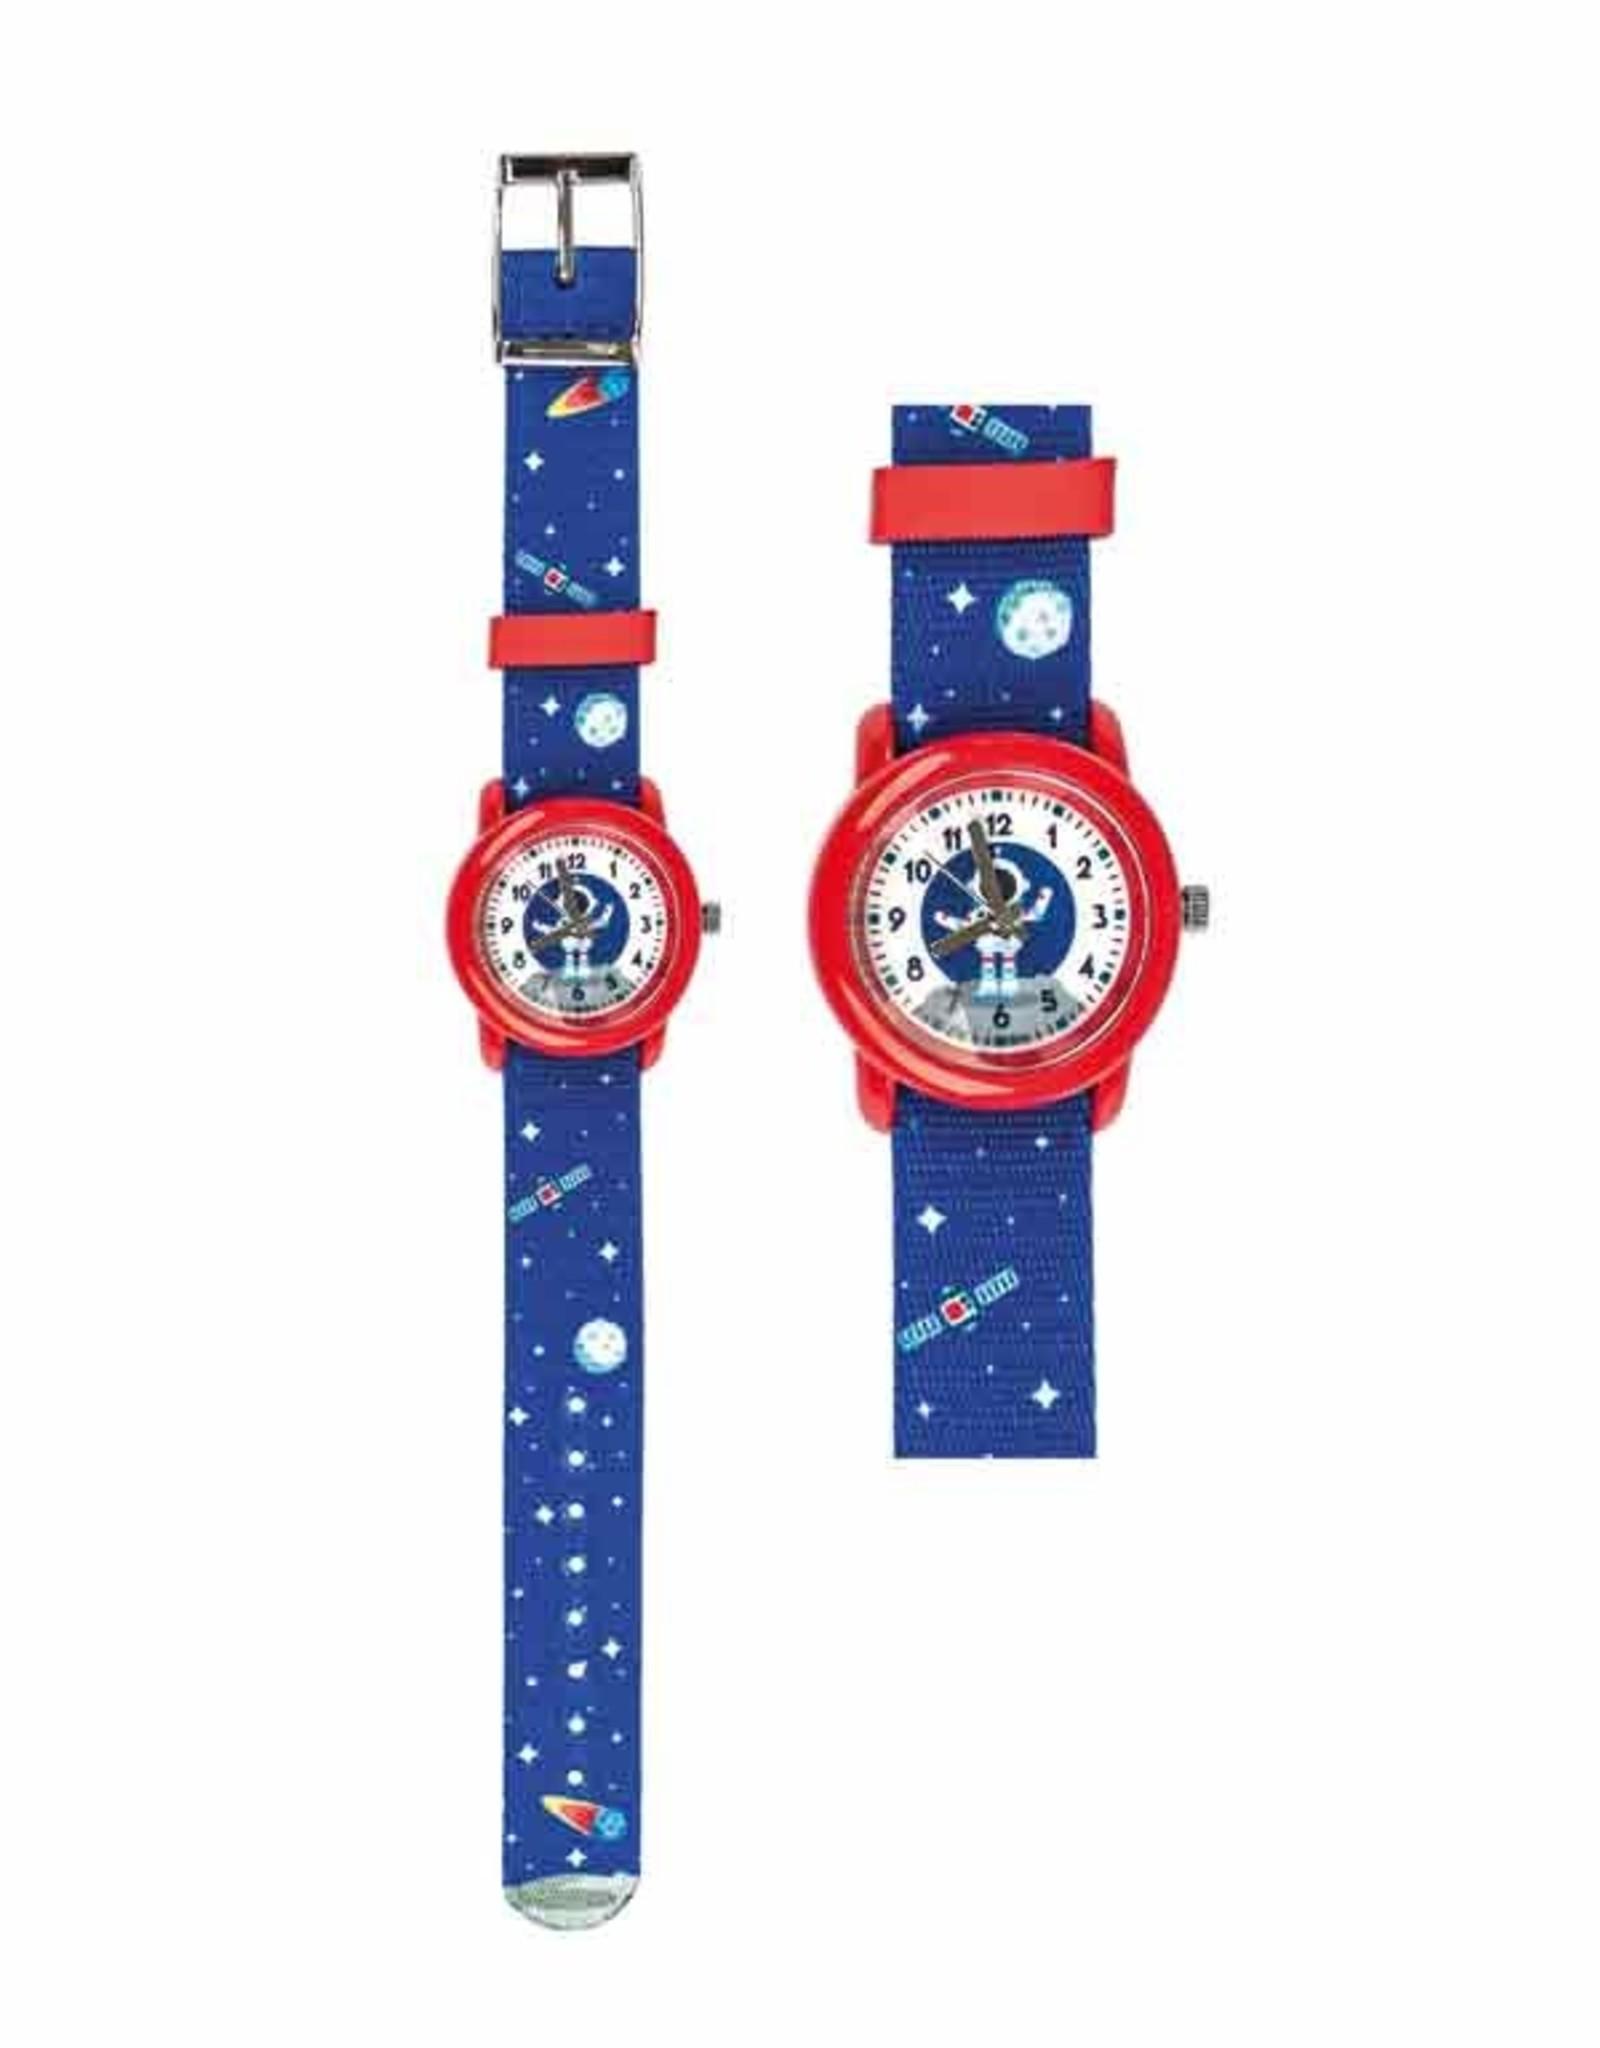 Horloge Astronaut